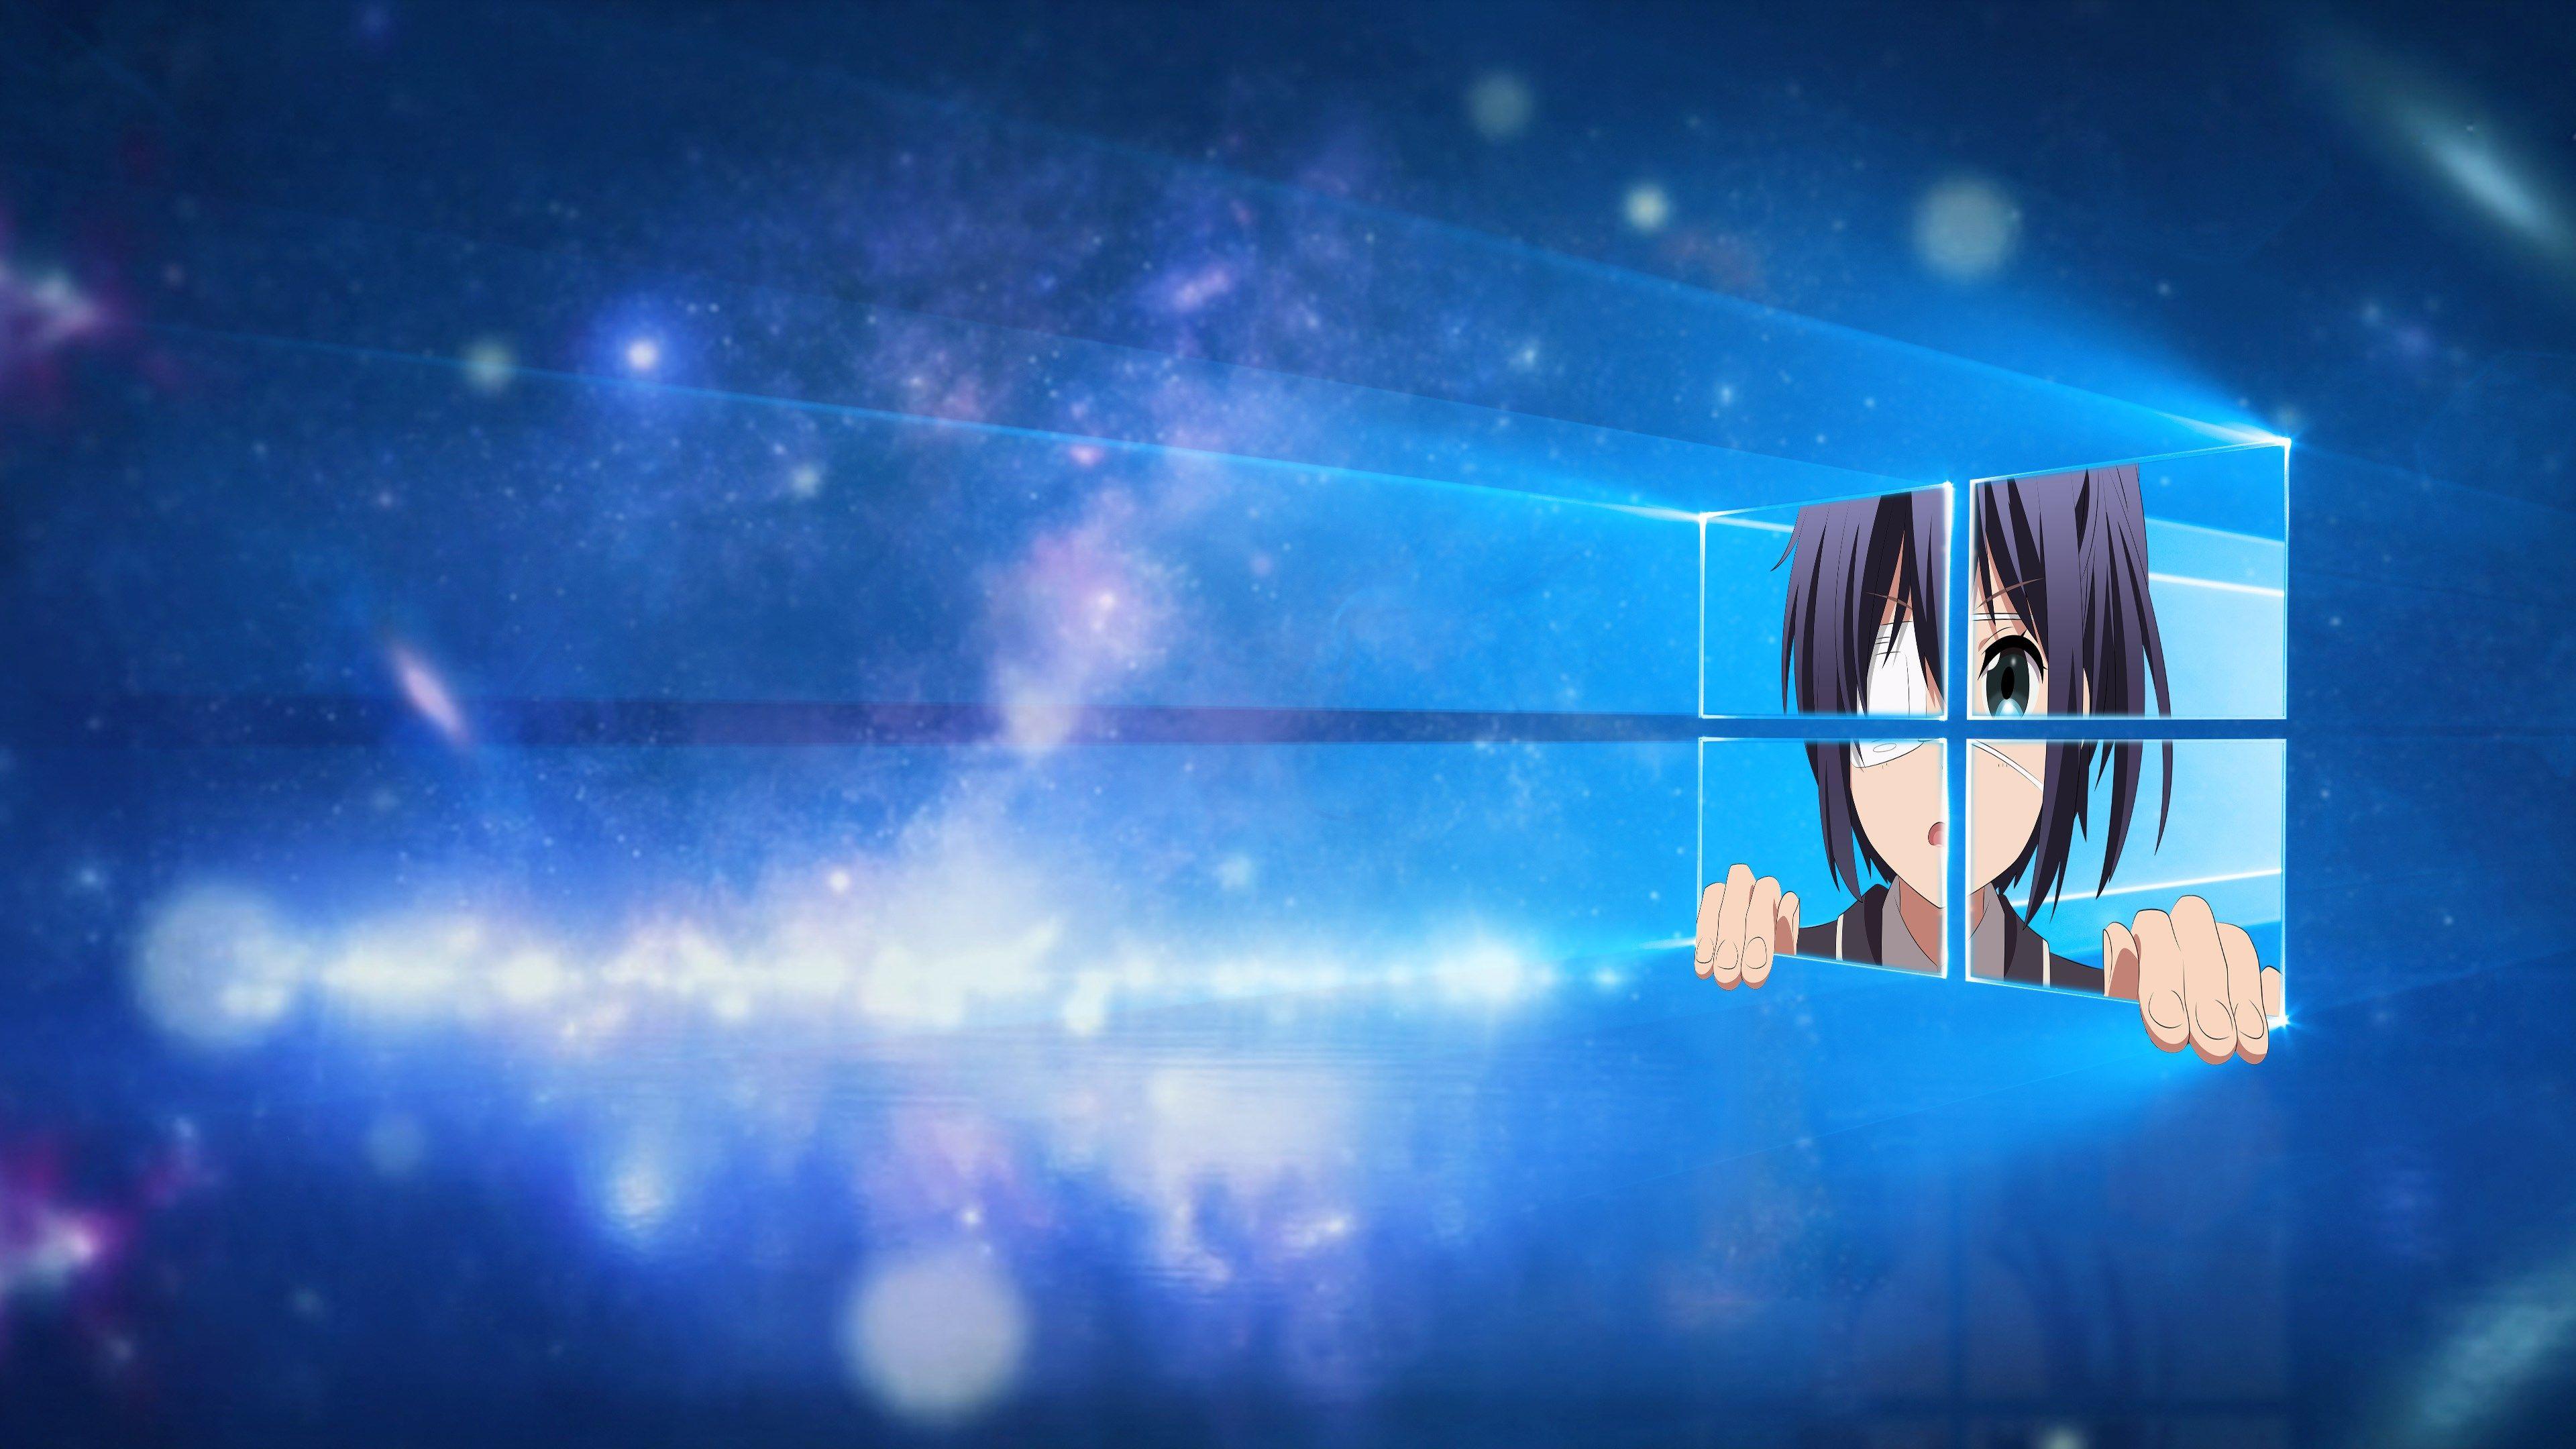 Free Anime Anime Wallpaper Wallpaper Windows 10 Hd Anime Wallpapers